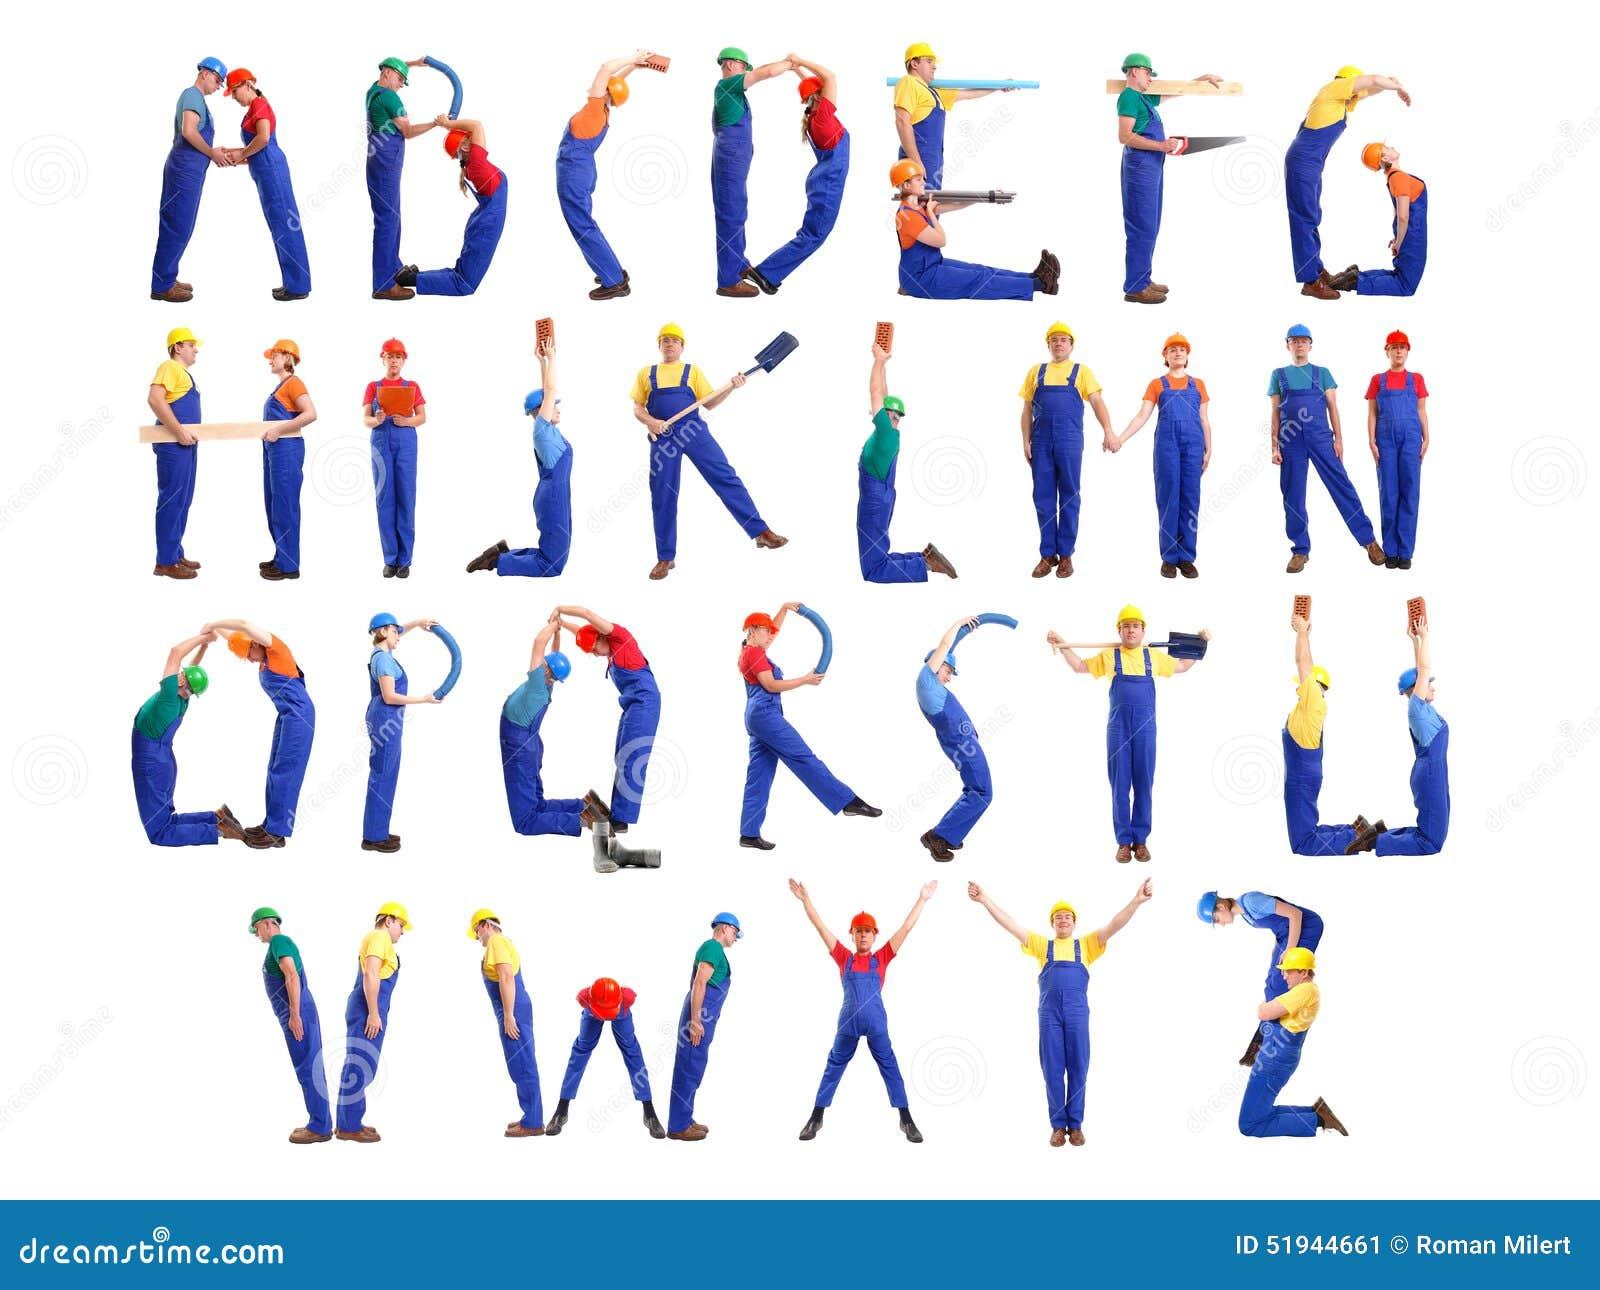 alphabet | Definition, History, & Facts | Britannica.com